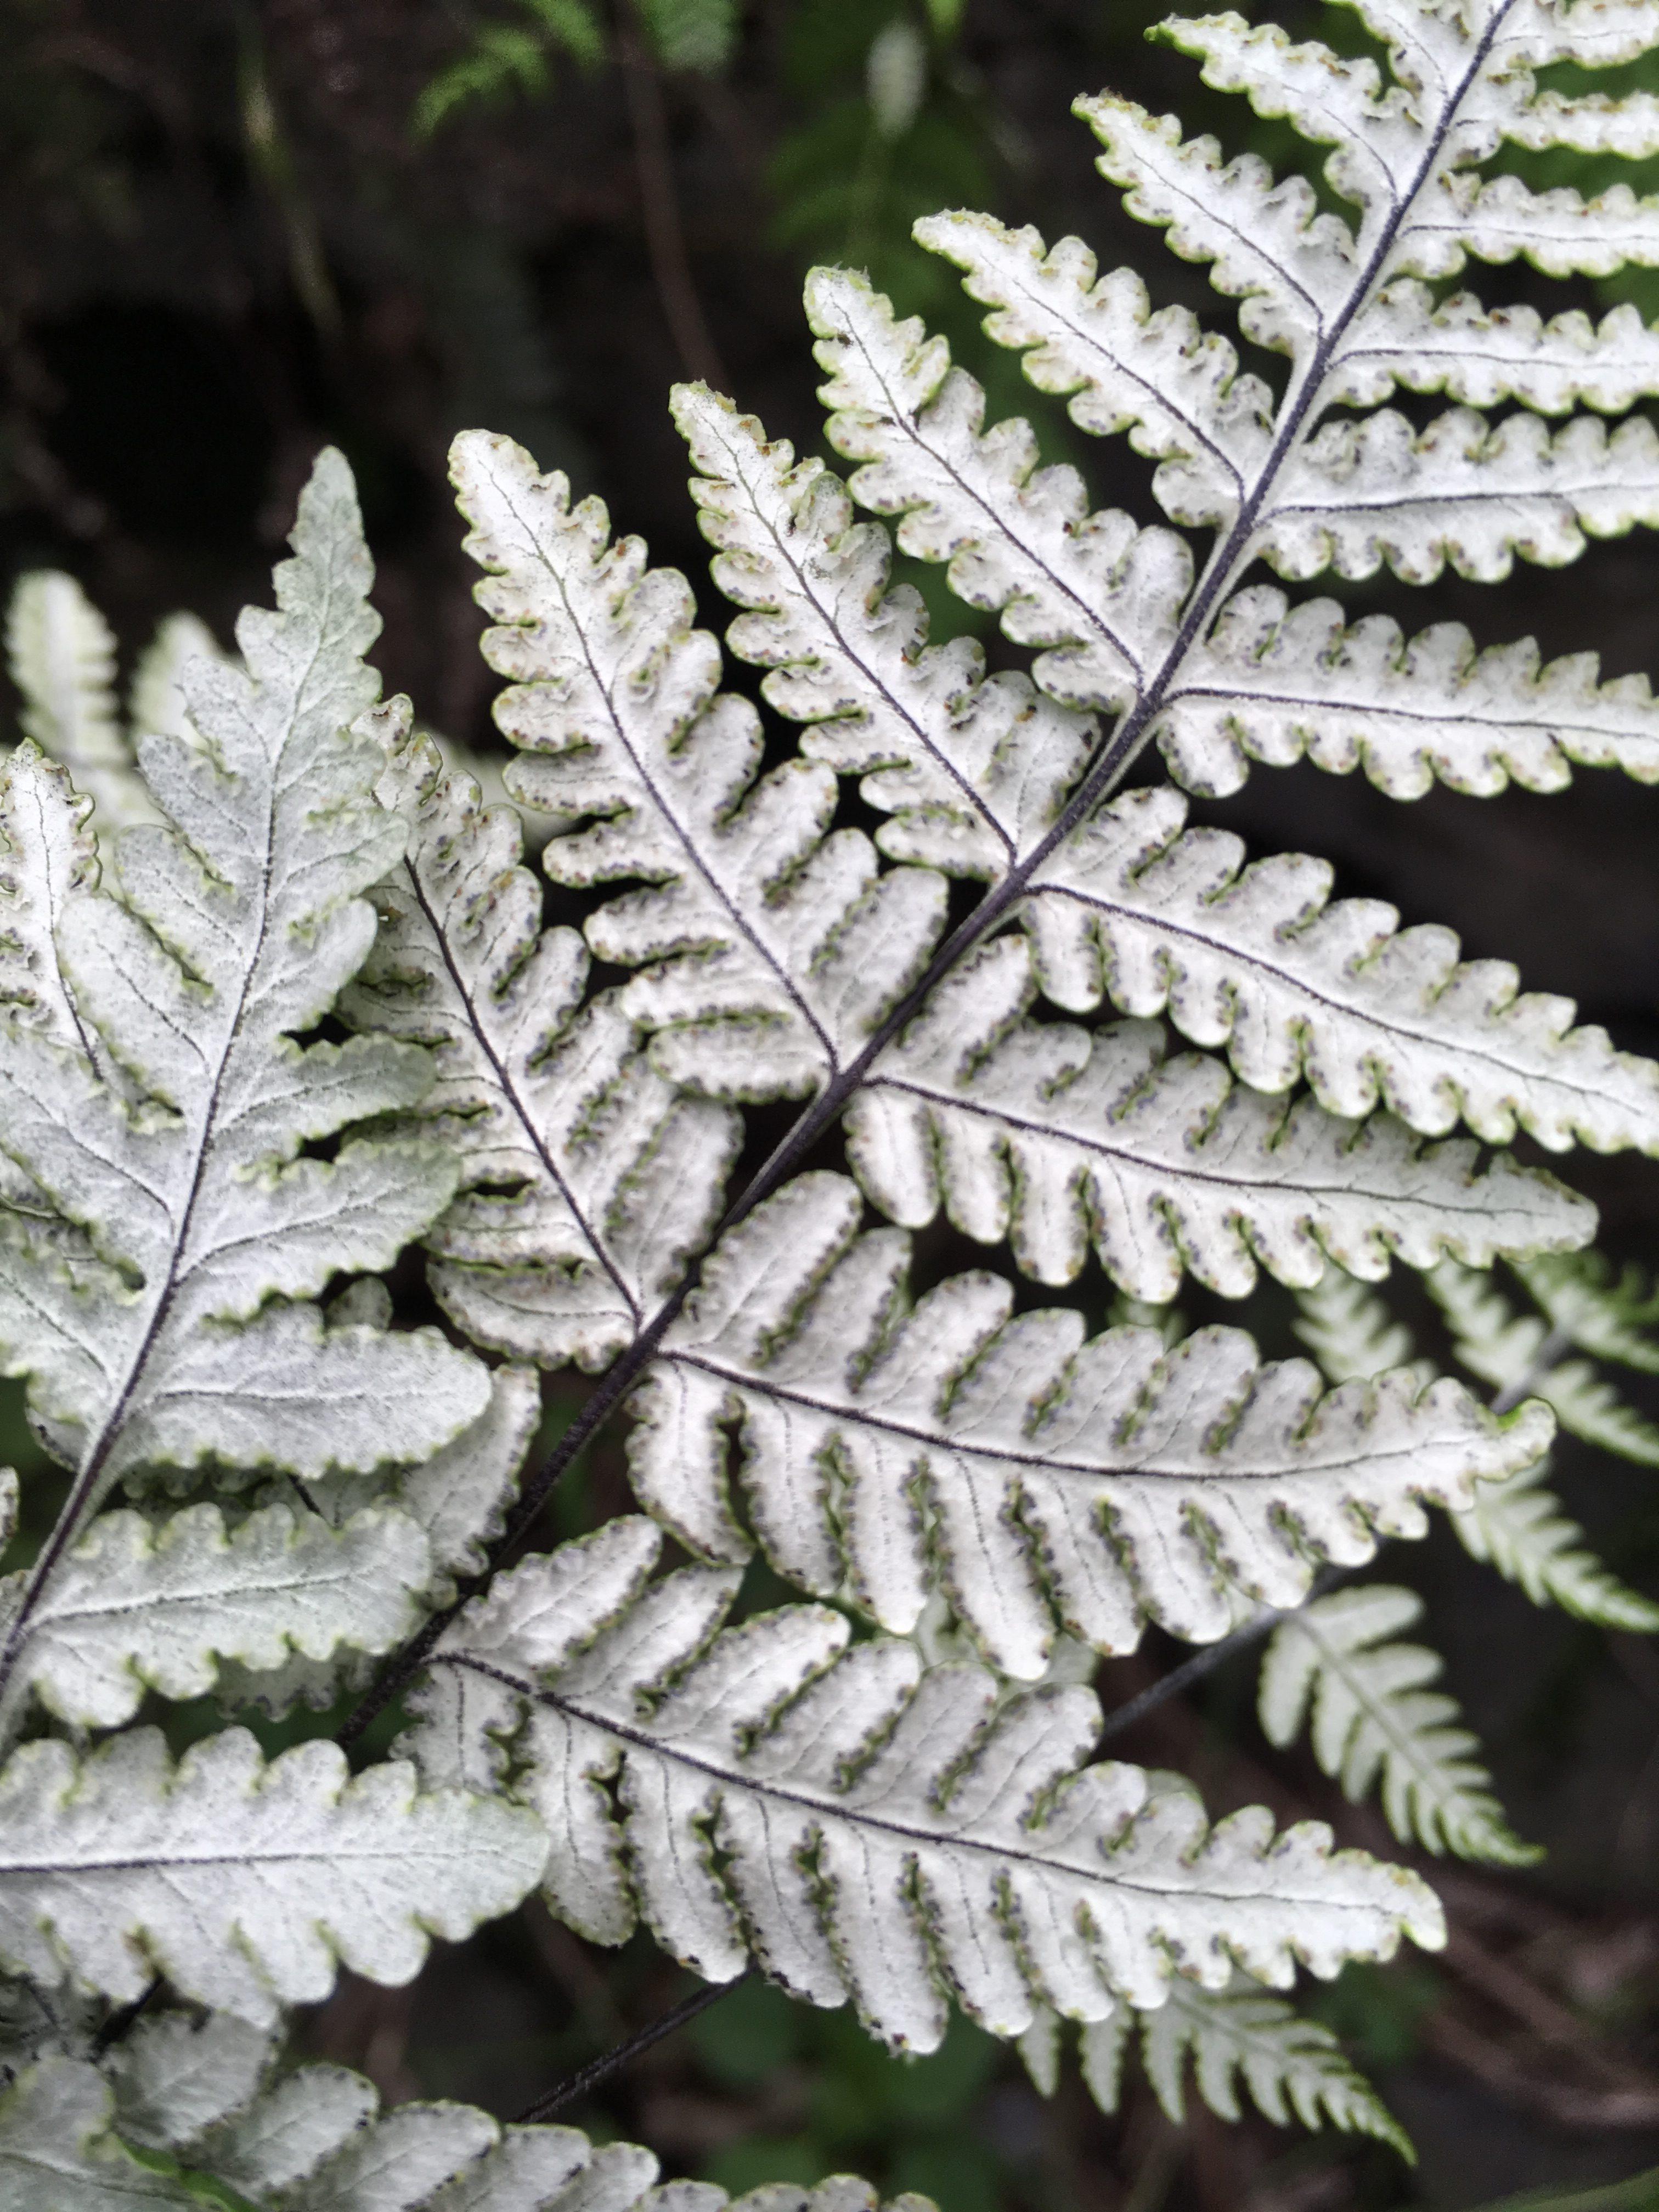 Cheilanthes farinosa